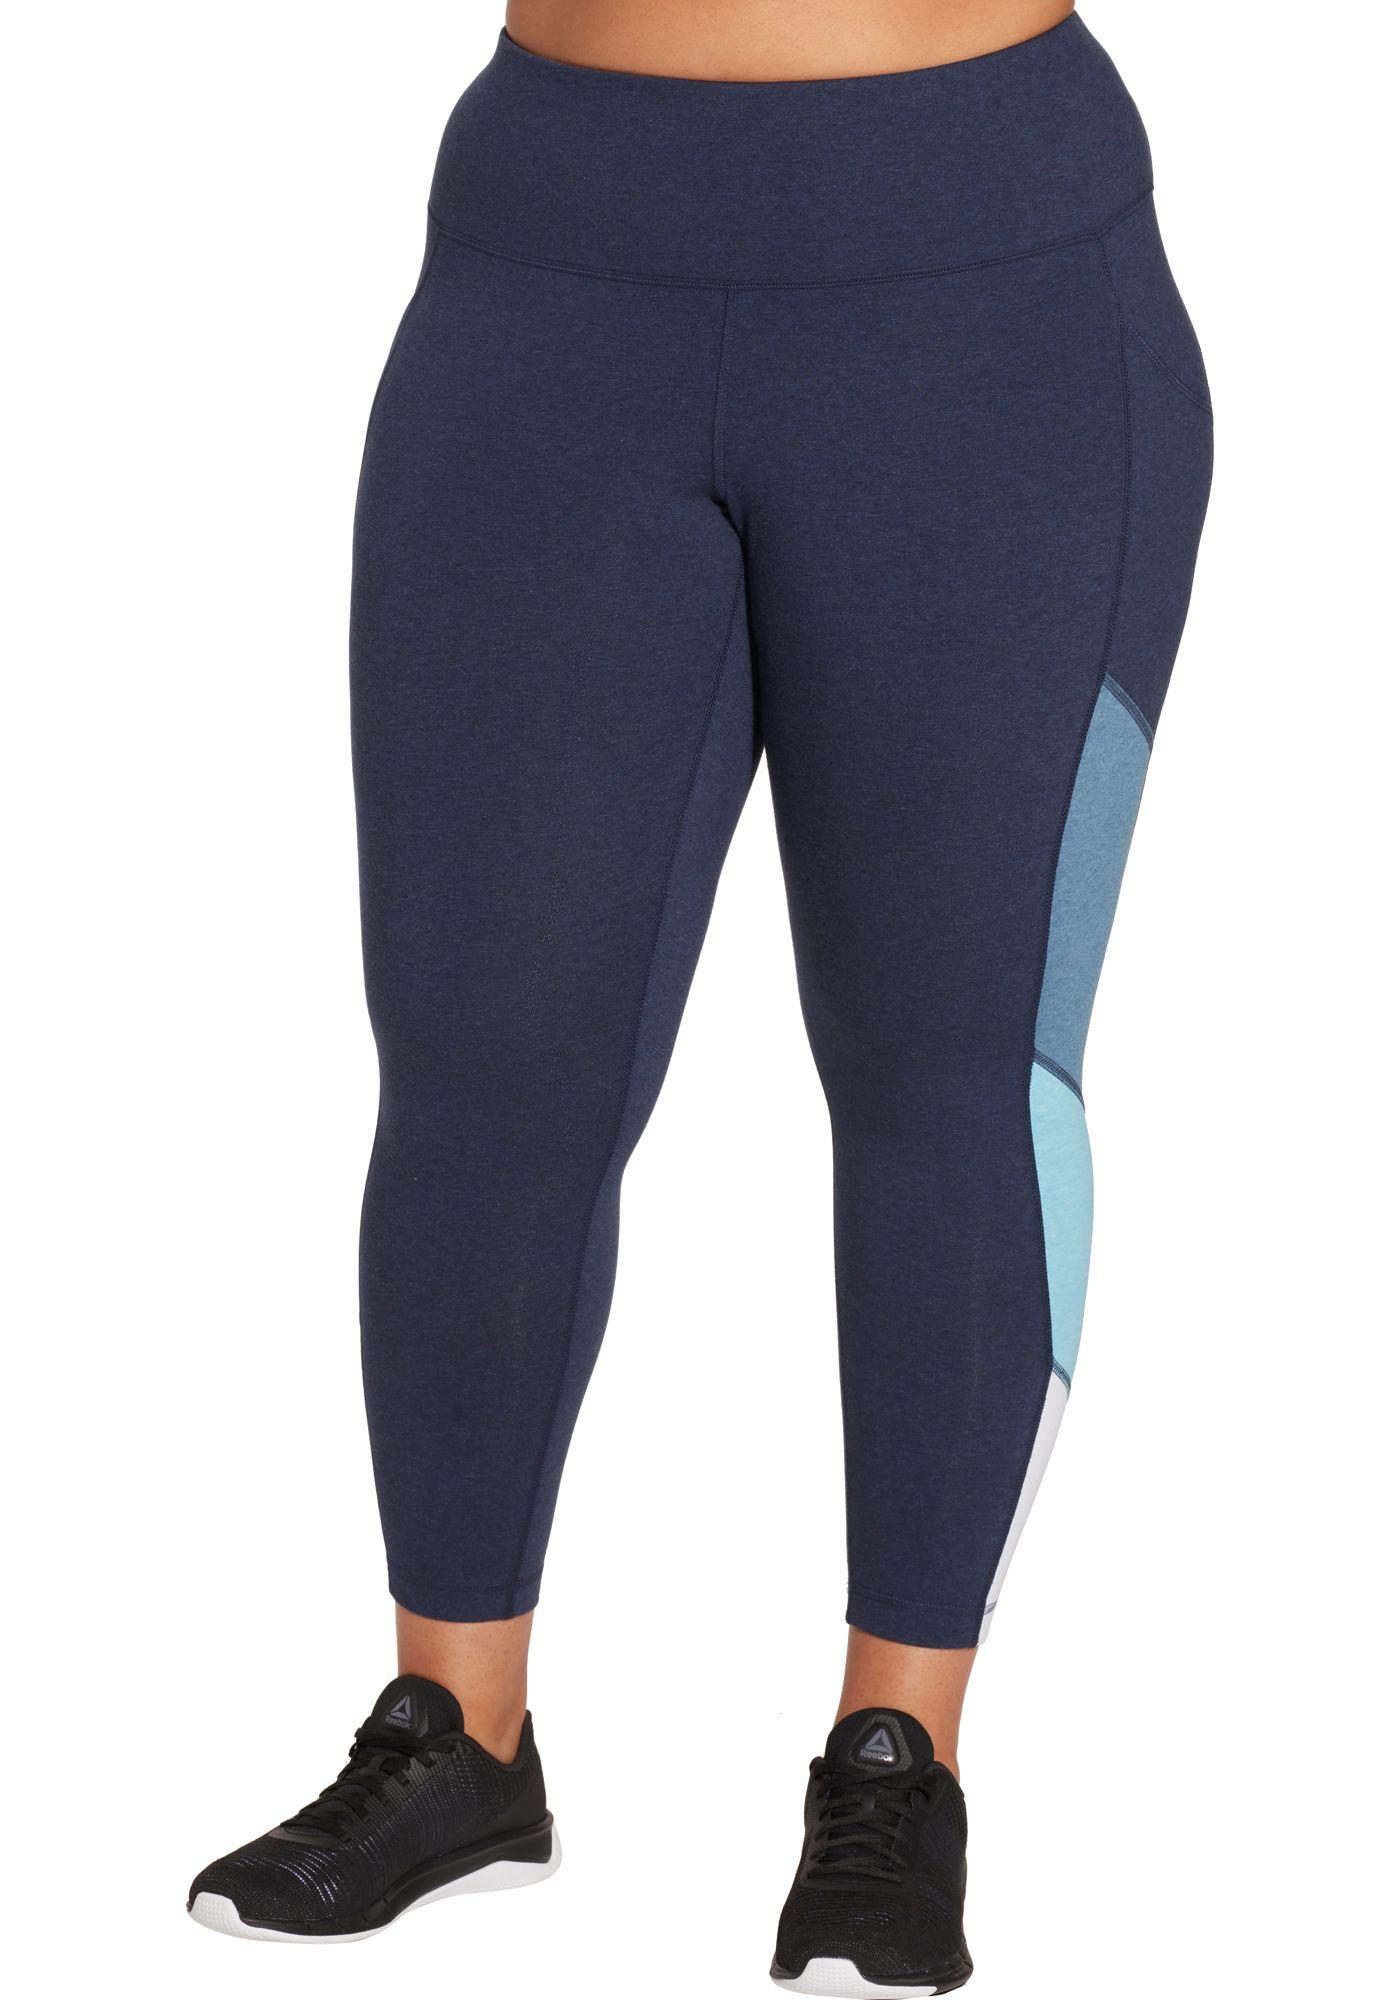 Reebok Women's Plus Size Highwaist 7/8 Gradient Flow Pants